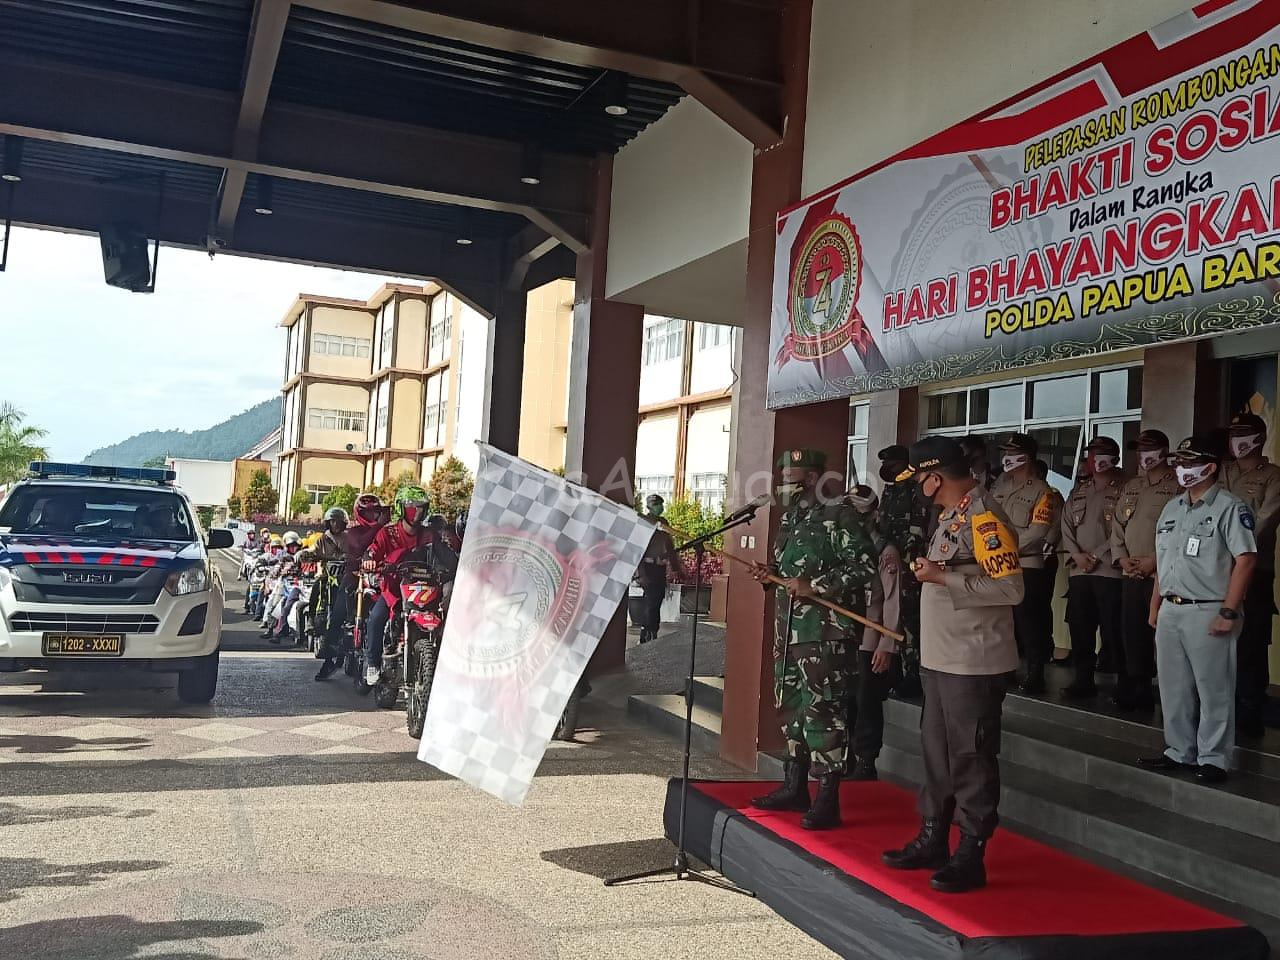 Polda Papua Barat Bagi Sembako Untuk TKBM, Ojek Dan Tenaga Medis Manokwari 24 IMG 20200626 WA0023